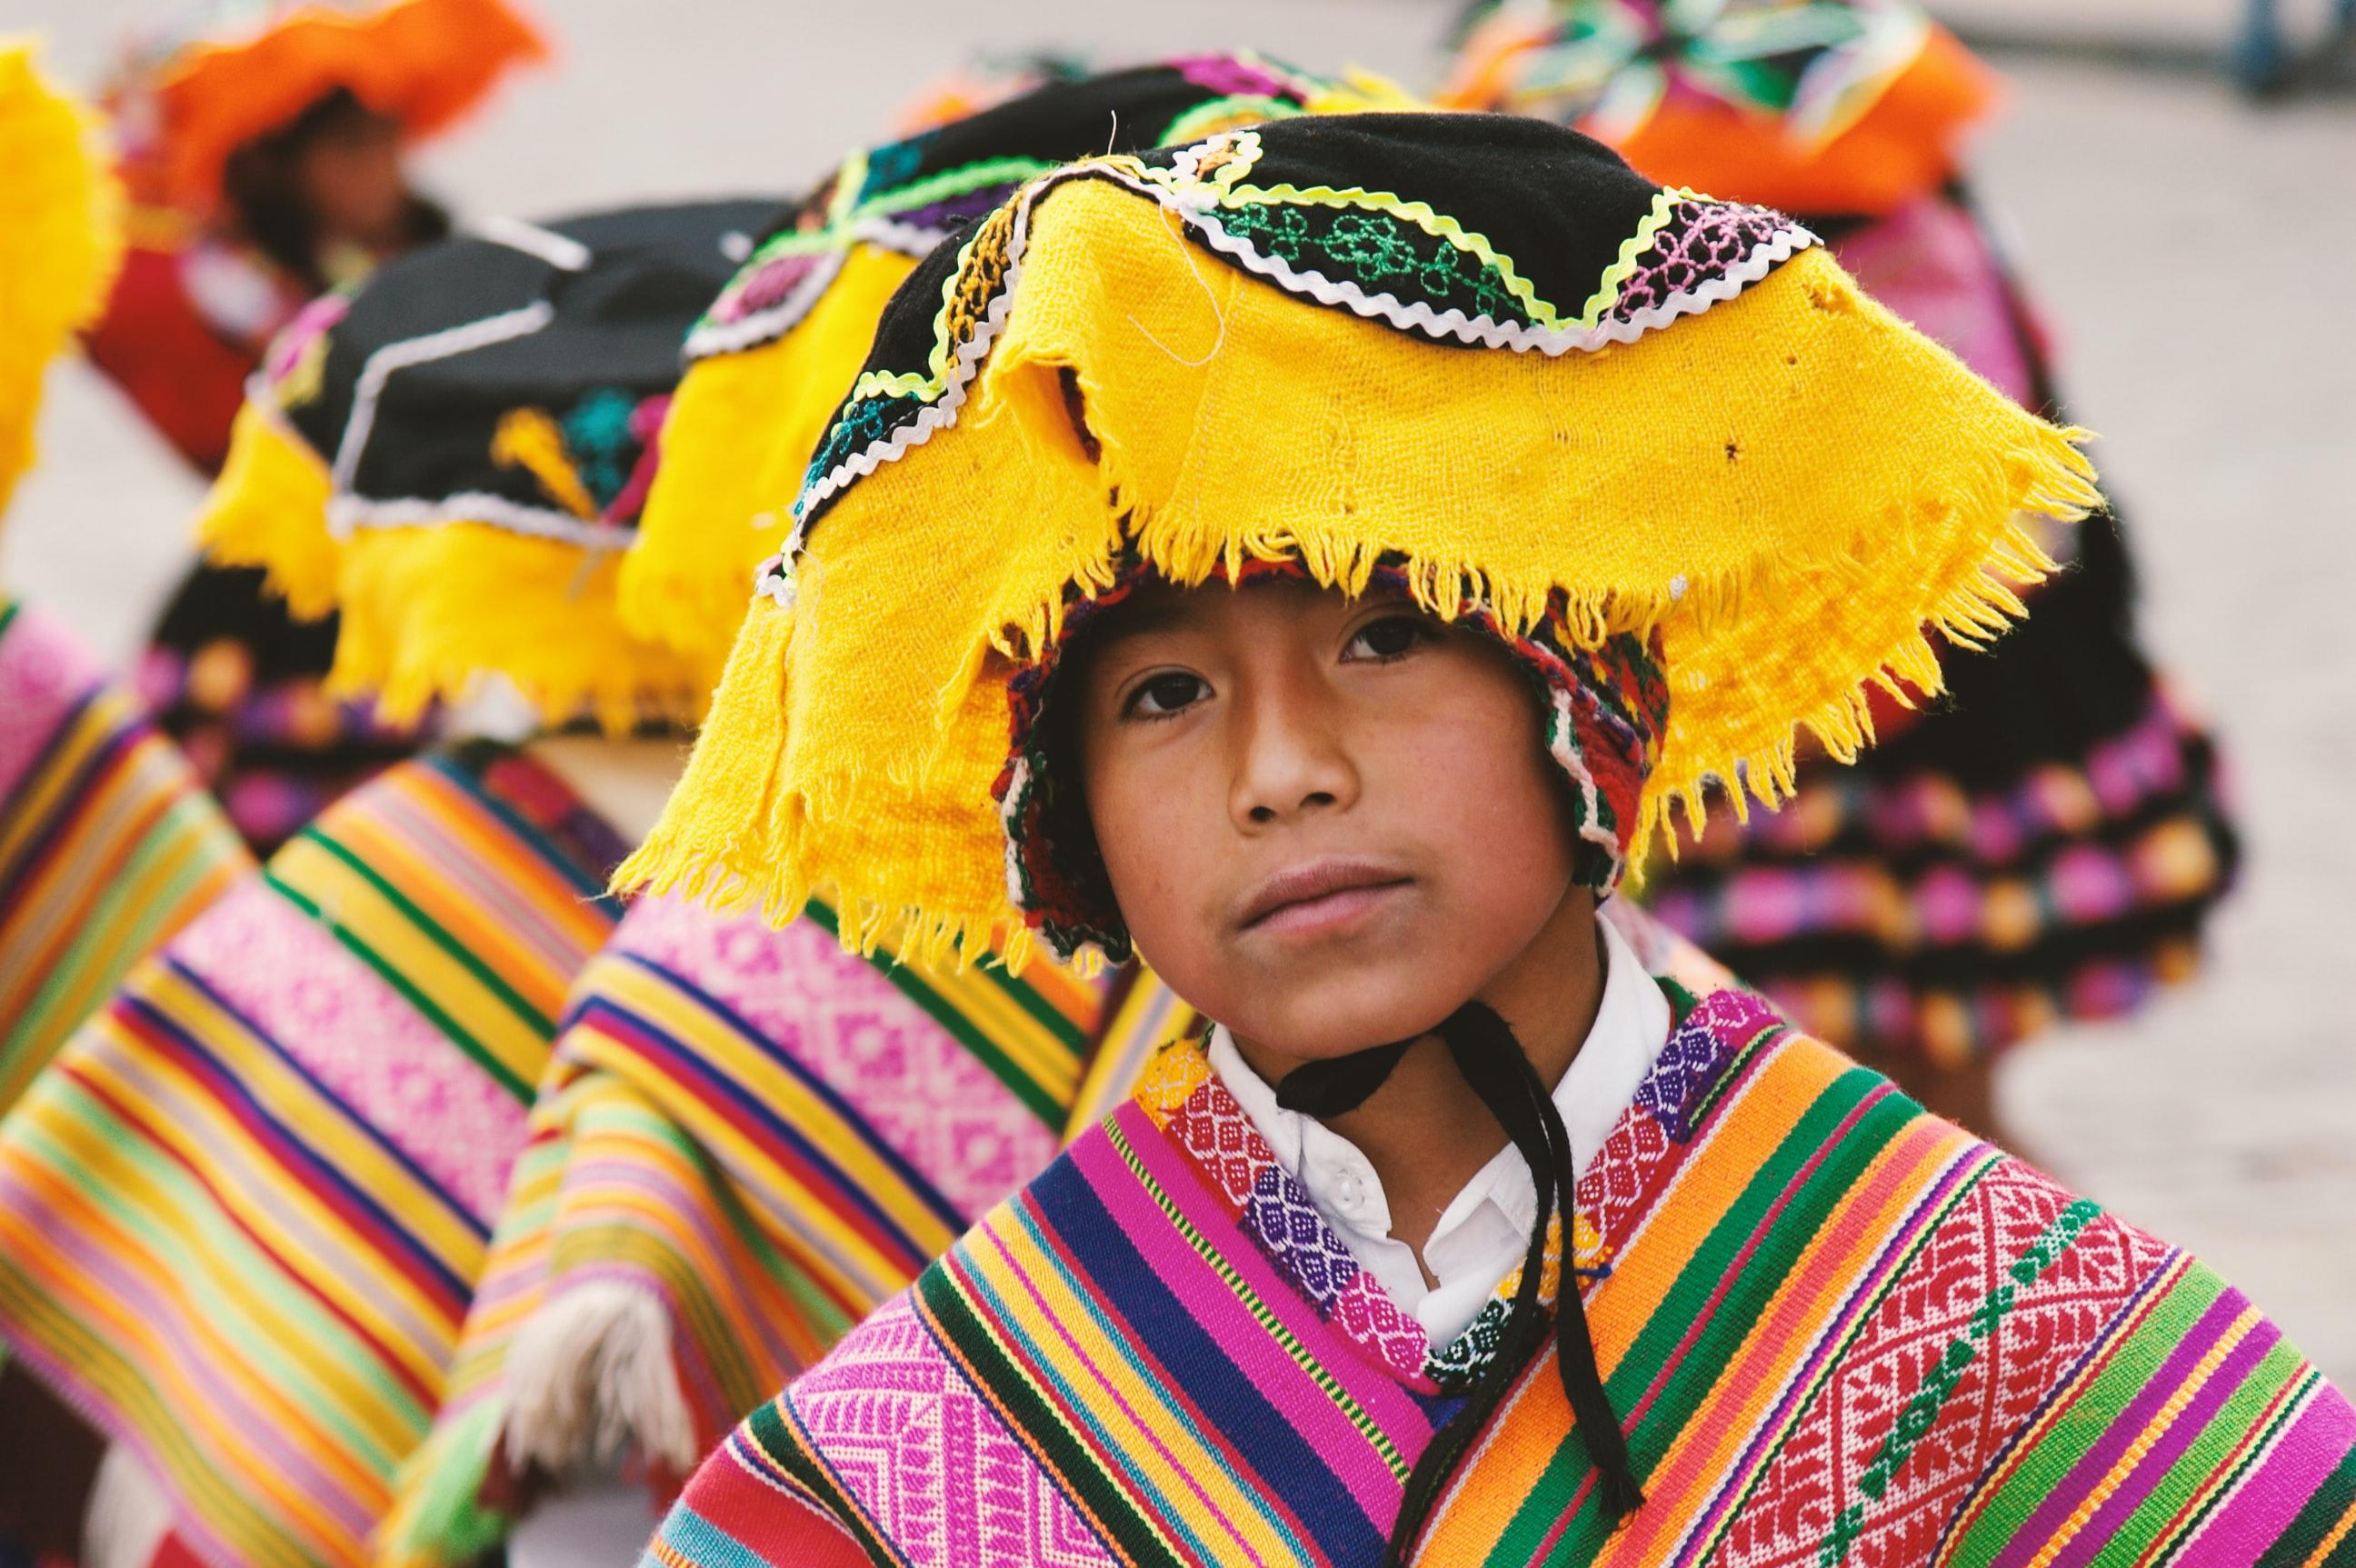 Summer Program - History | Arcos Journeys: Inca Adventure from Lima to Machu Picchu